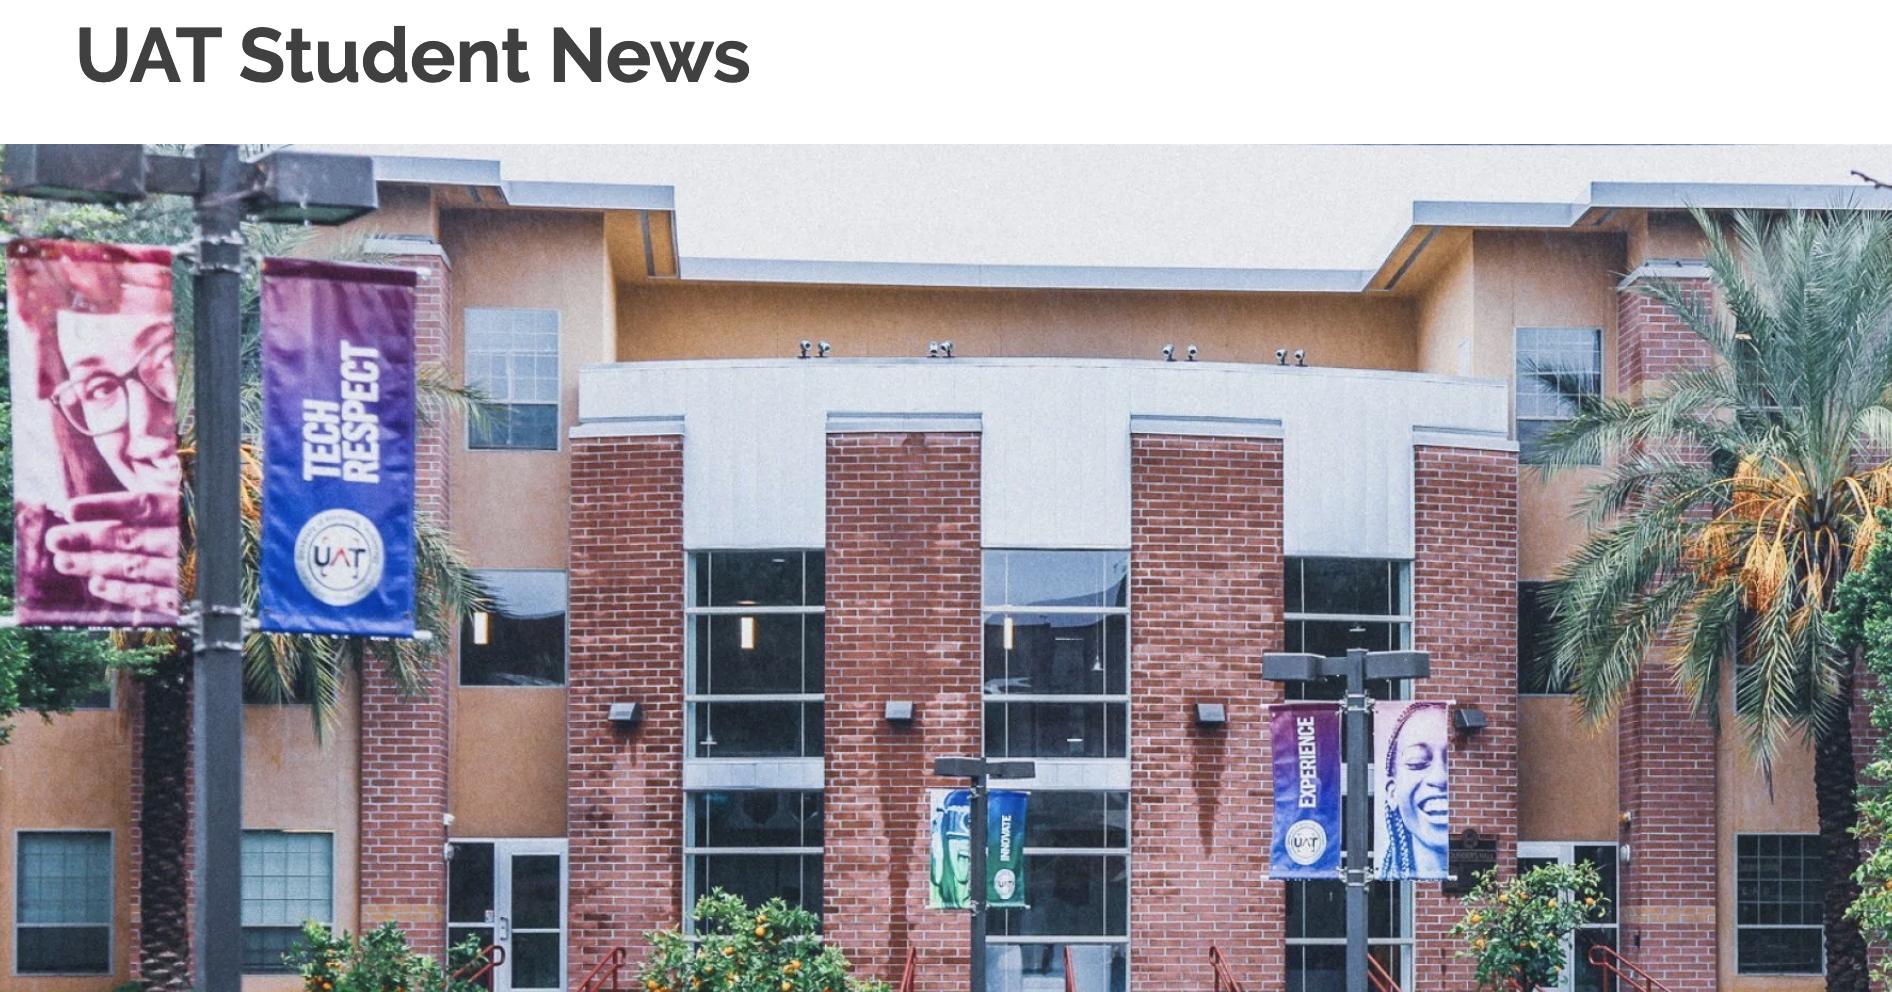 UAT Student News